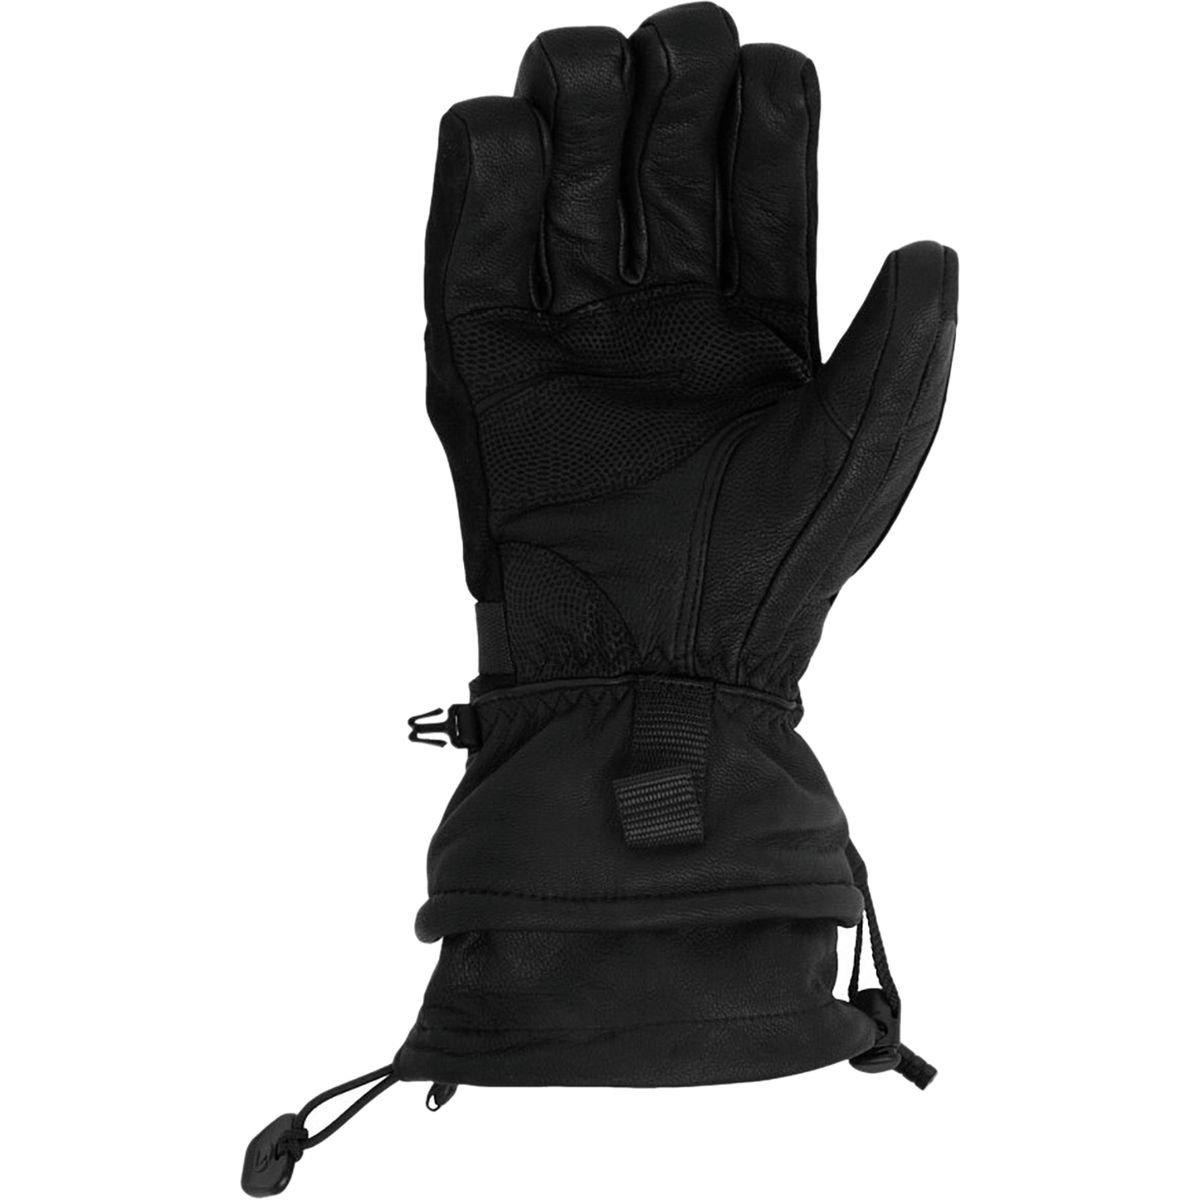 Mens leather gloves rei - Mens Leather Gloves Rei 54